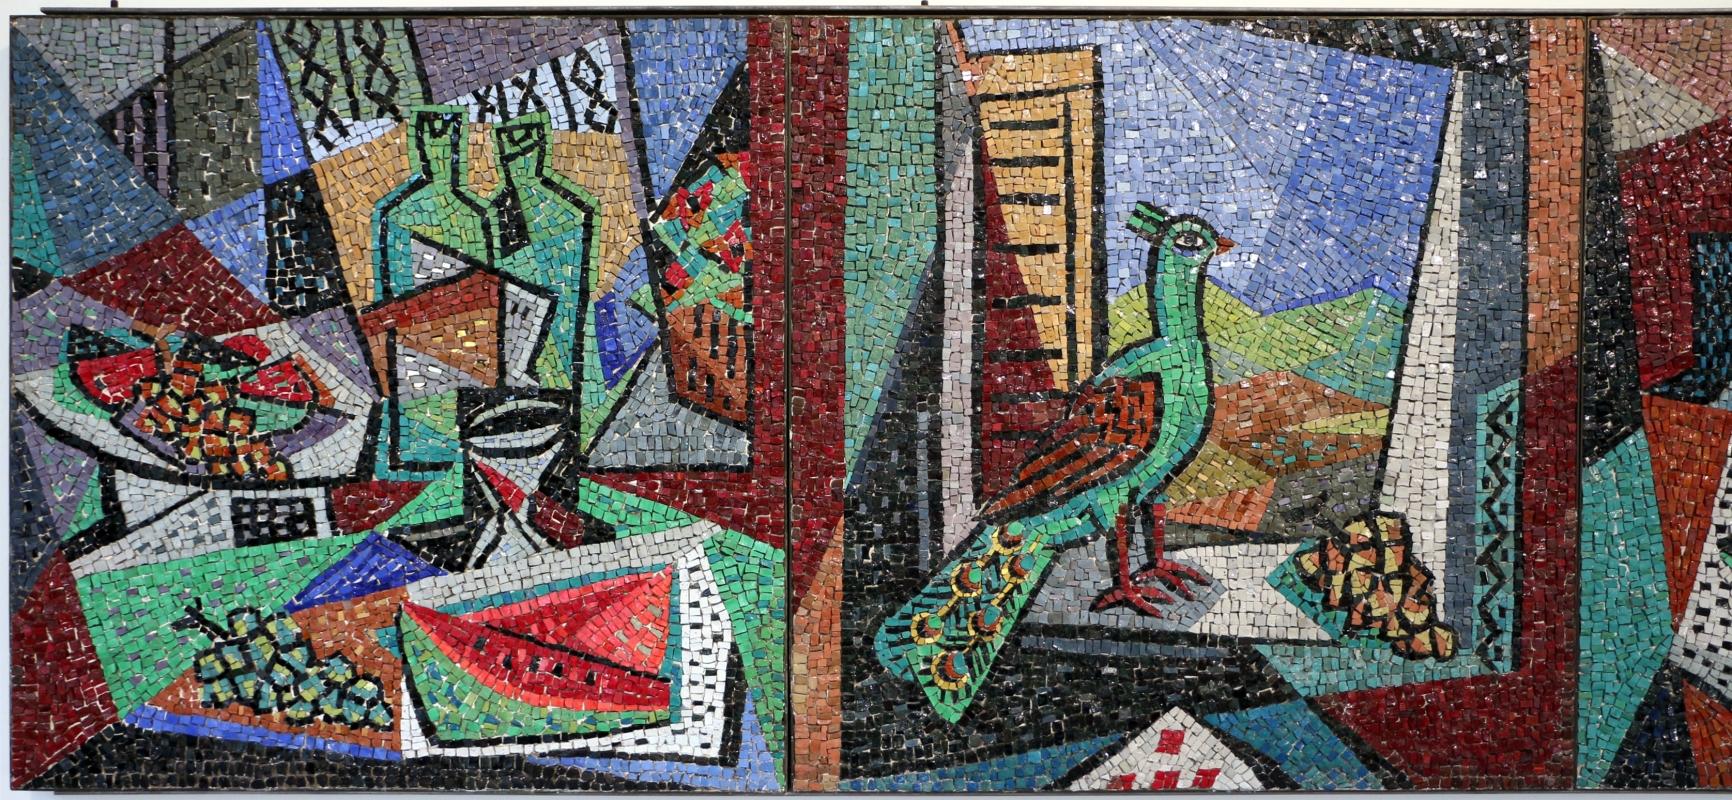 Lino melano, senza titolo, 1952, 03 - Sailko - Ravenna (RA)